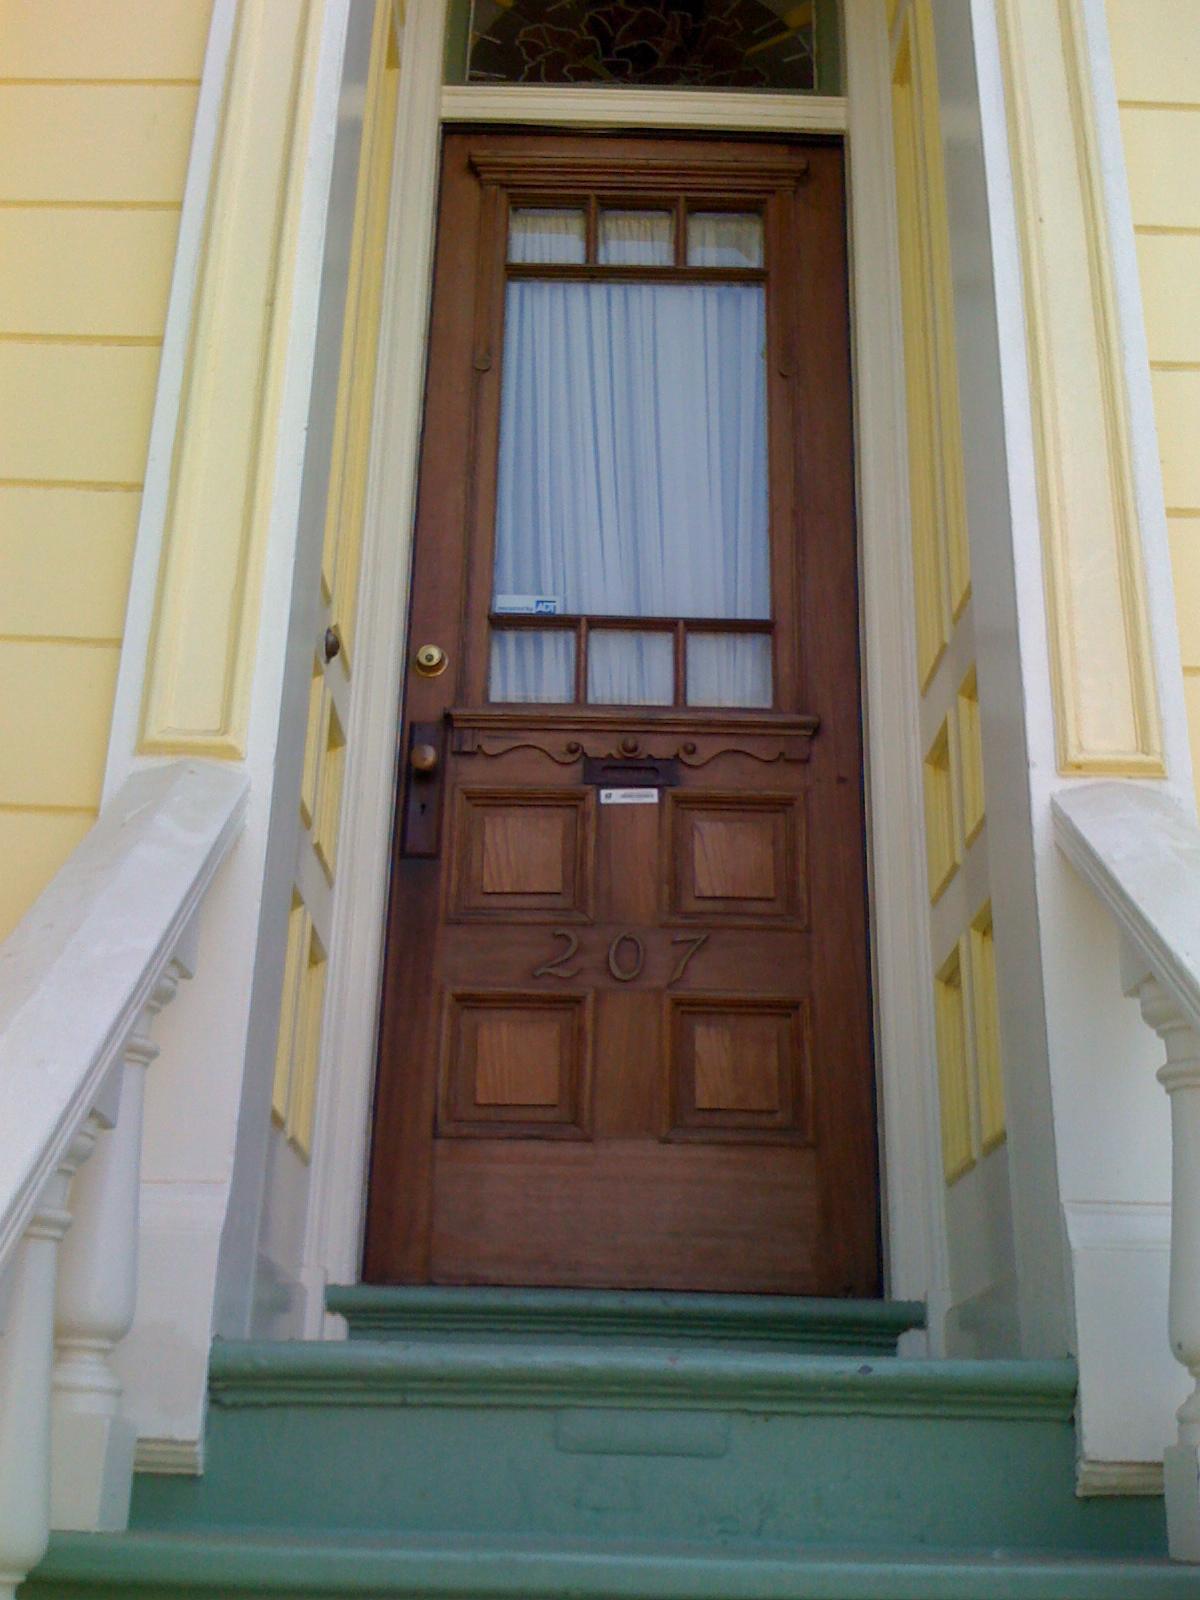 Other doors in the neighborhood & Little Lantern